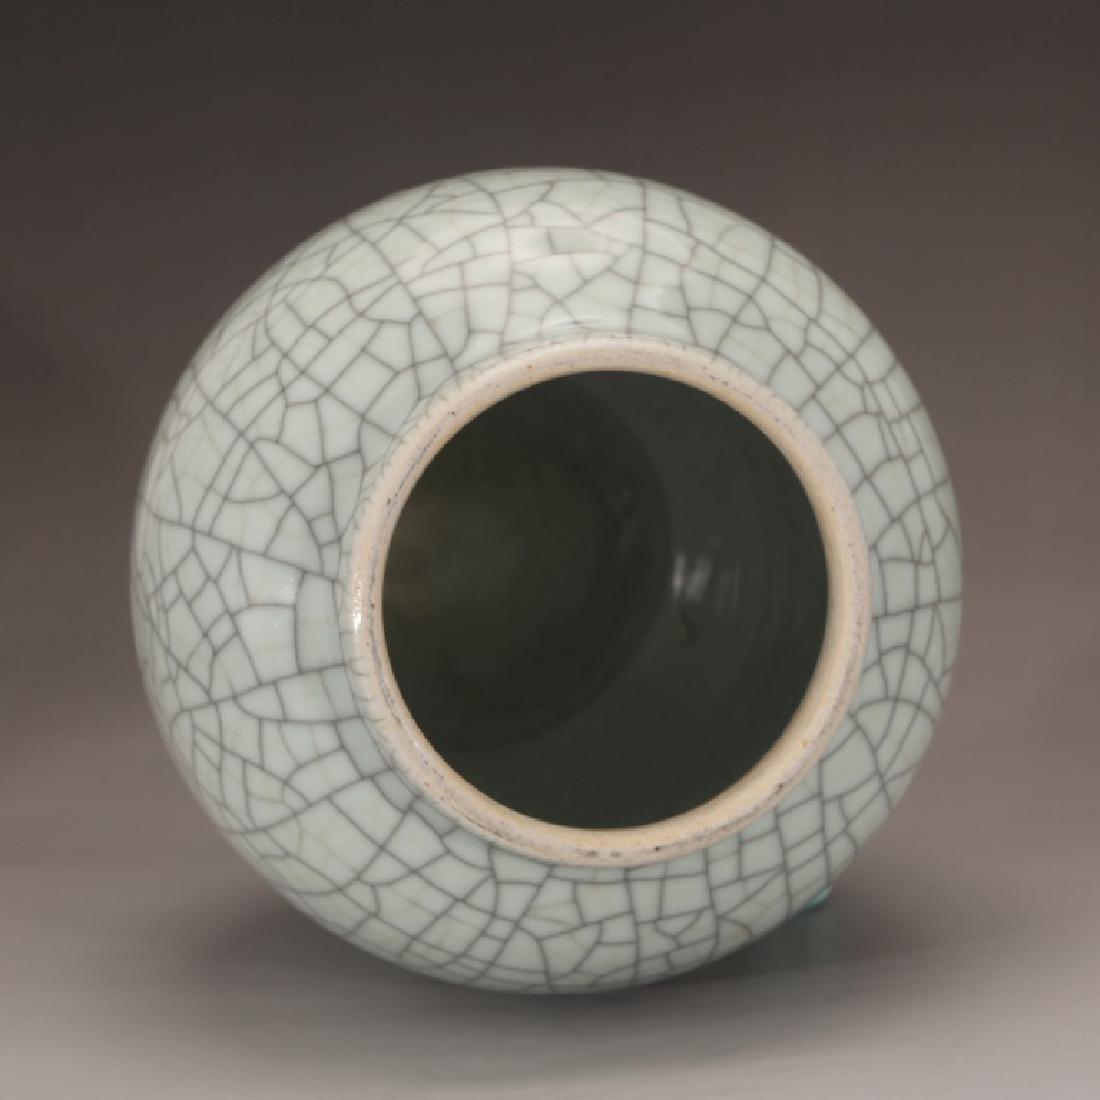 Chinese 19 C Guanyao Crackle Glaze Porcelain Jar - 2